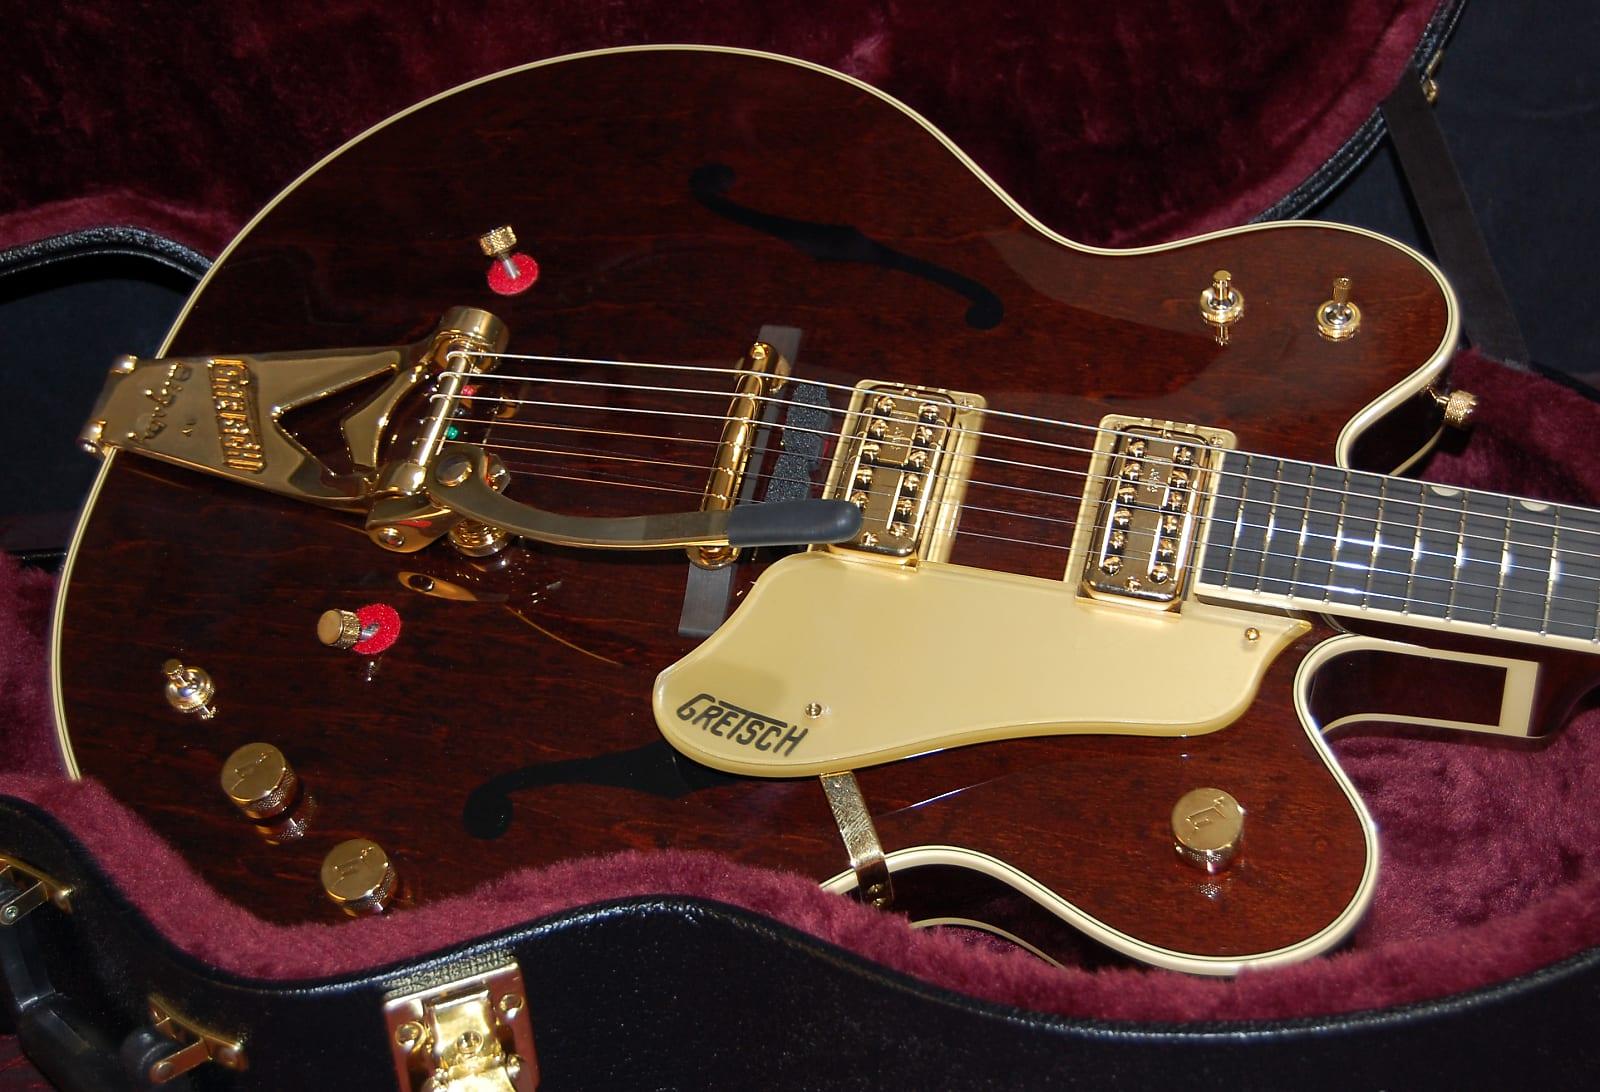 G6122-1962 Chet Atkins Country Gentleman Genuine Gretsch Pickguard Gold